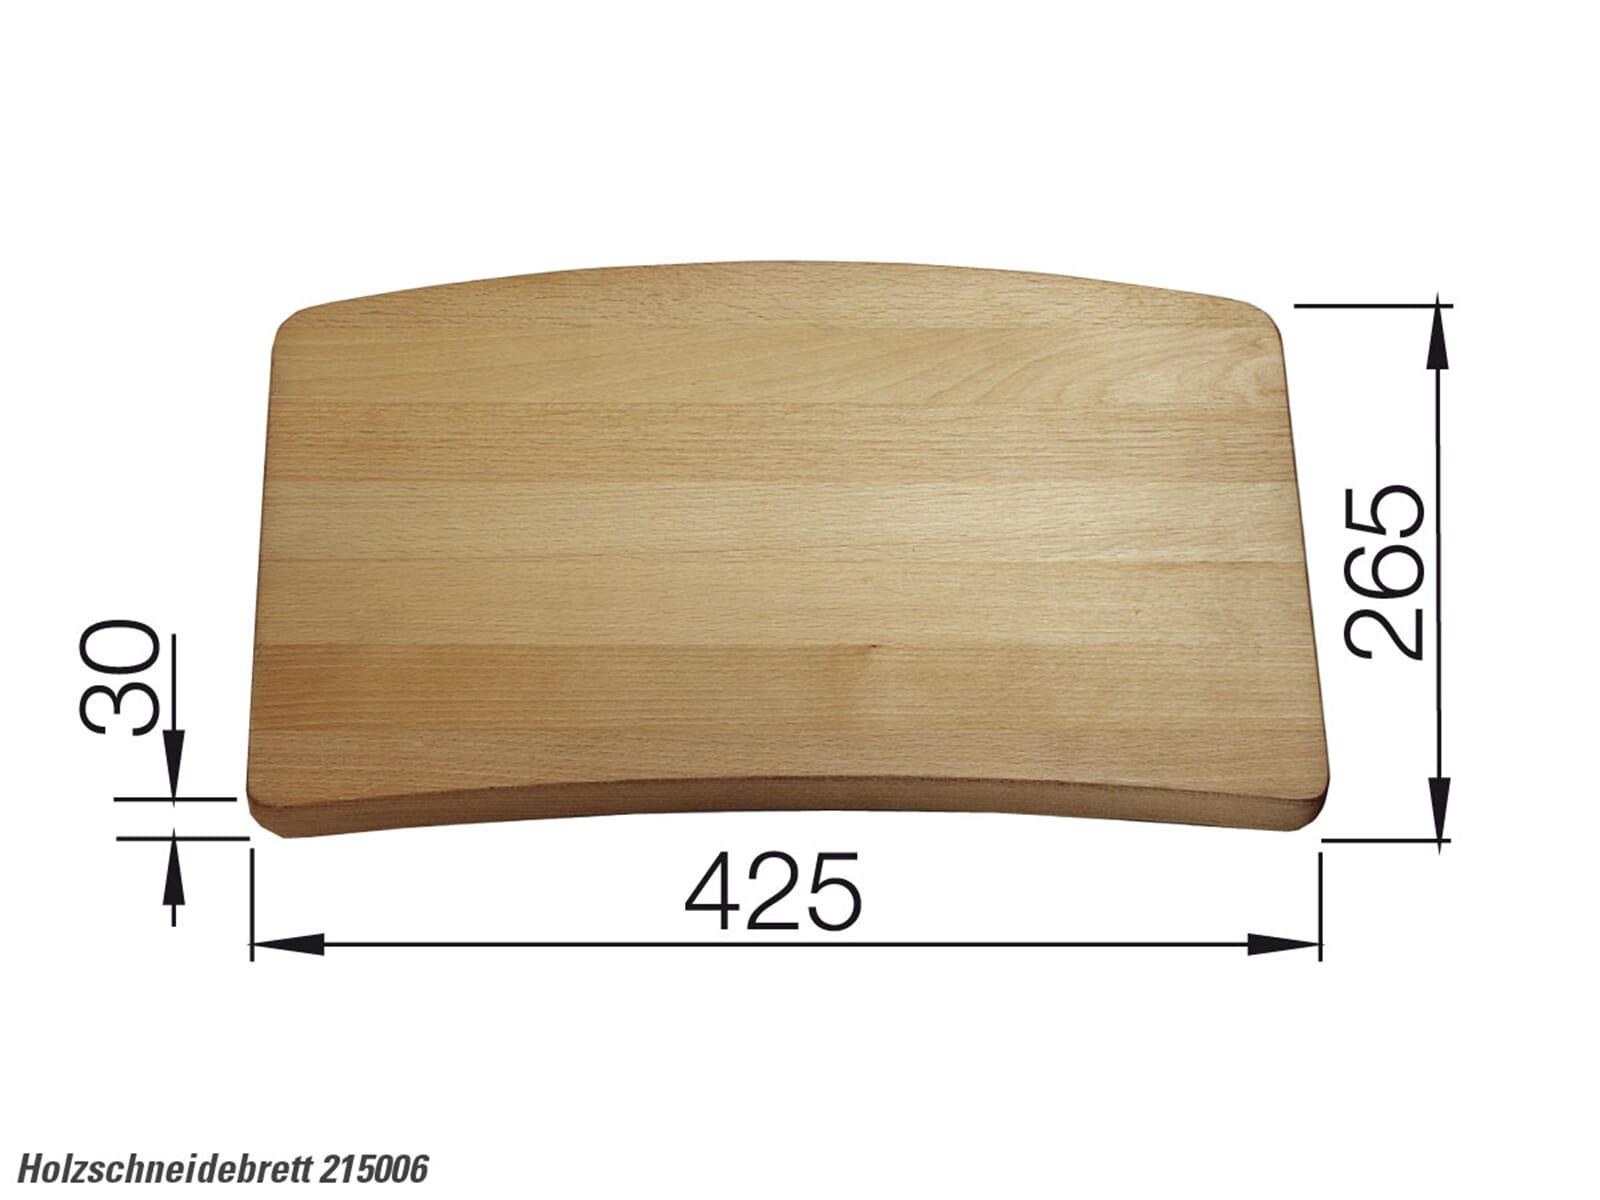 Blanco 215 006 Holzschneidebrett Buche